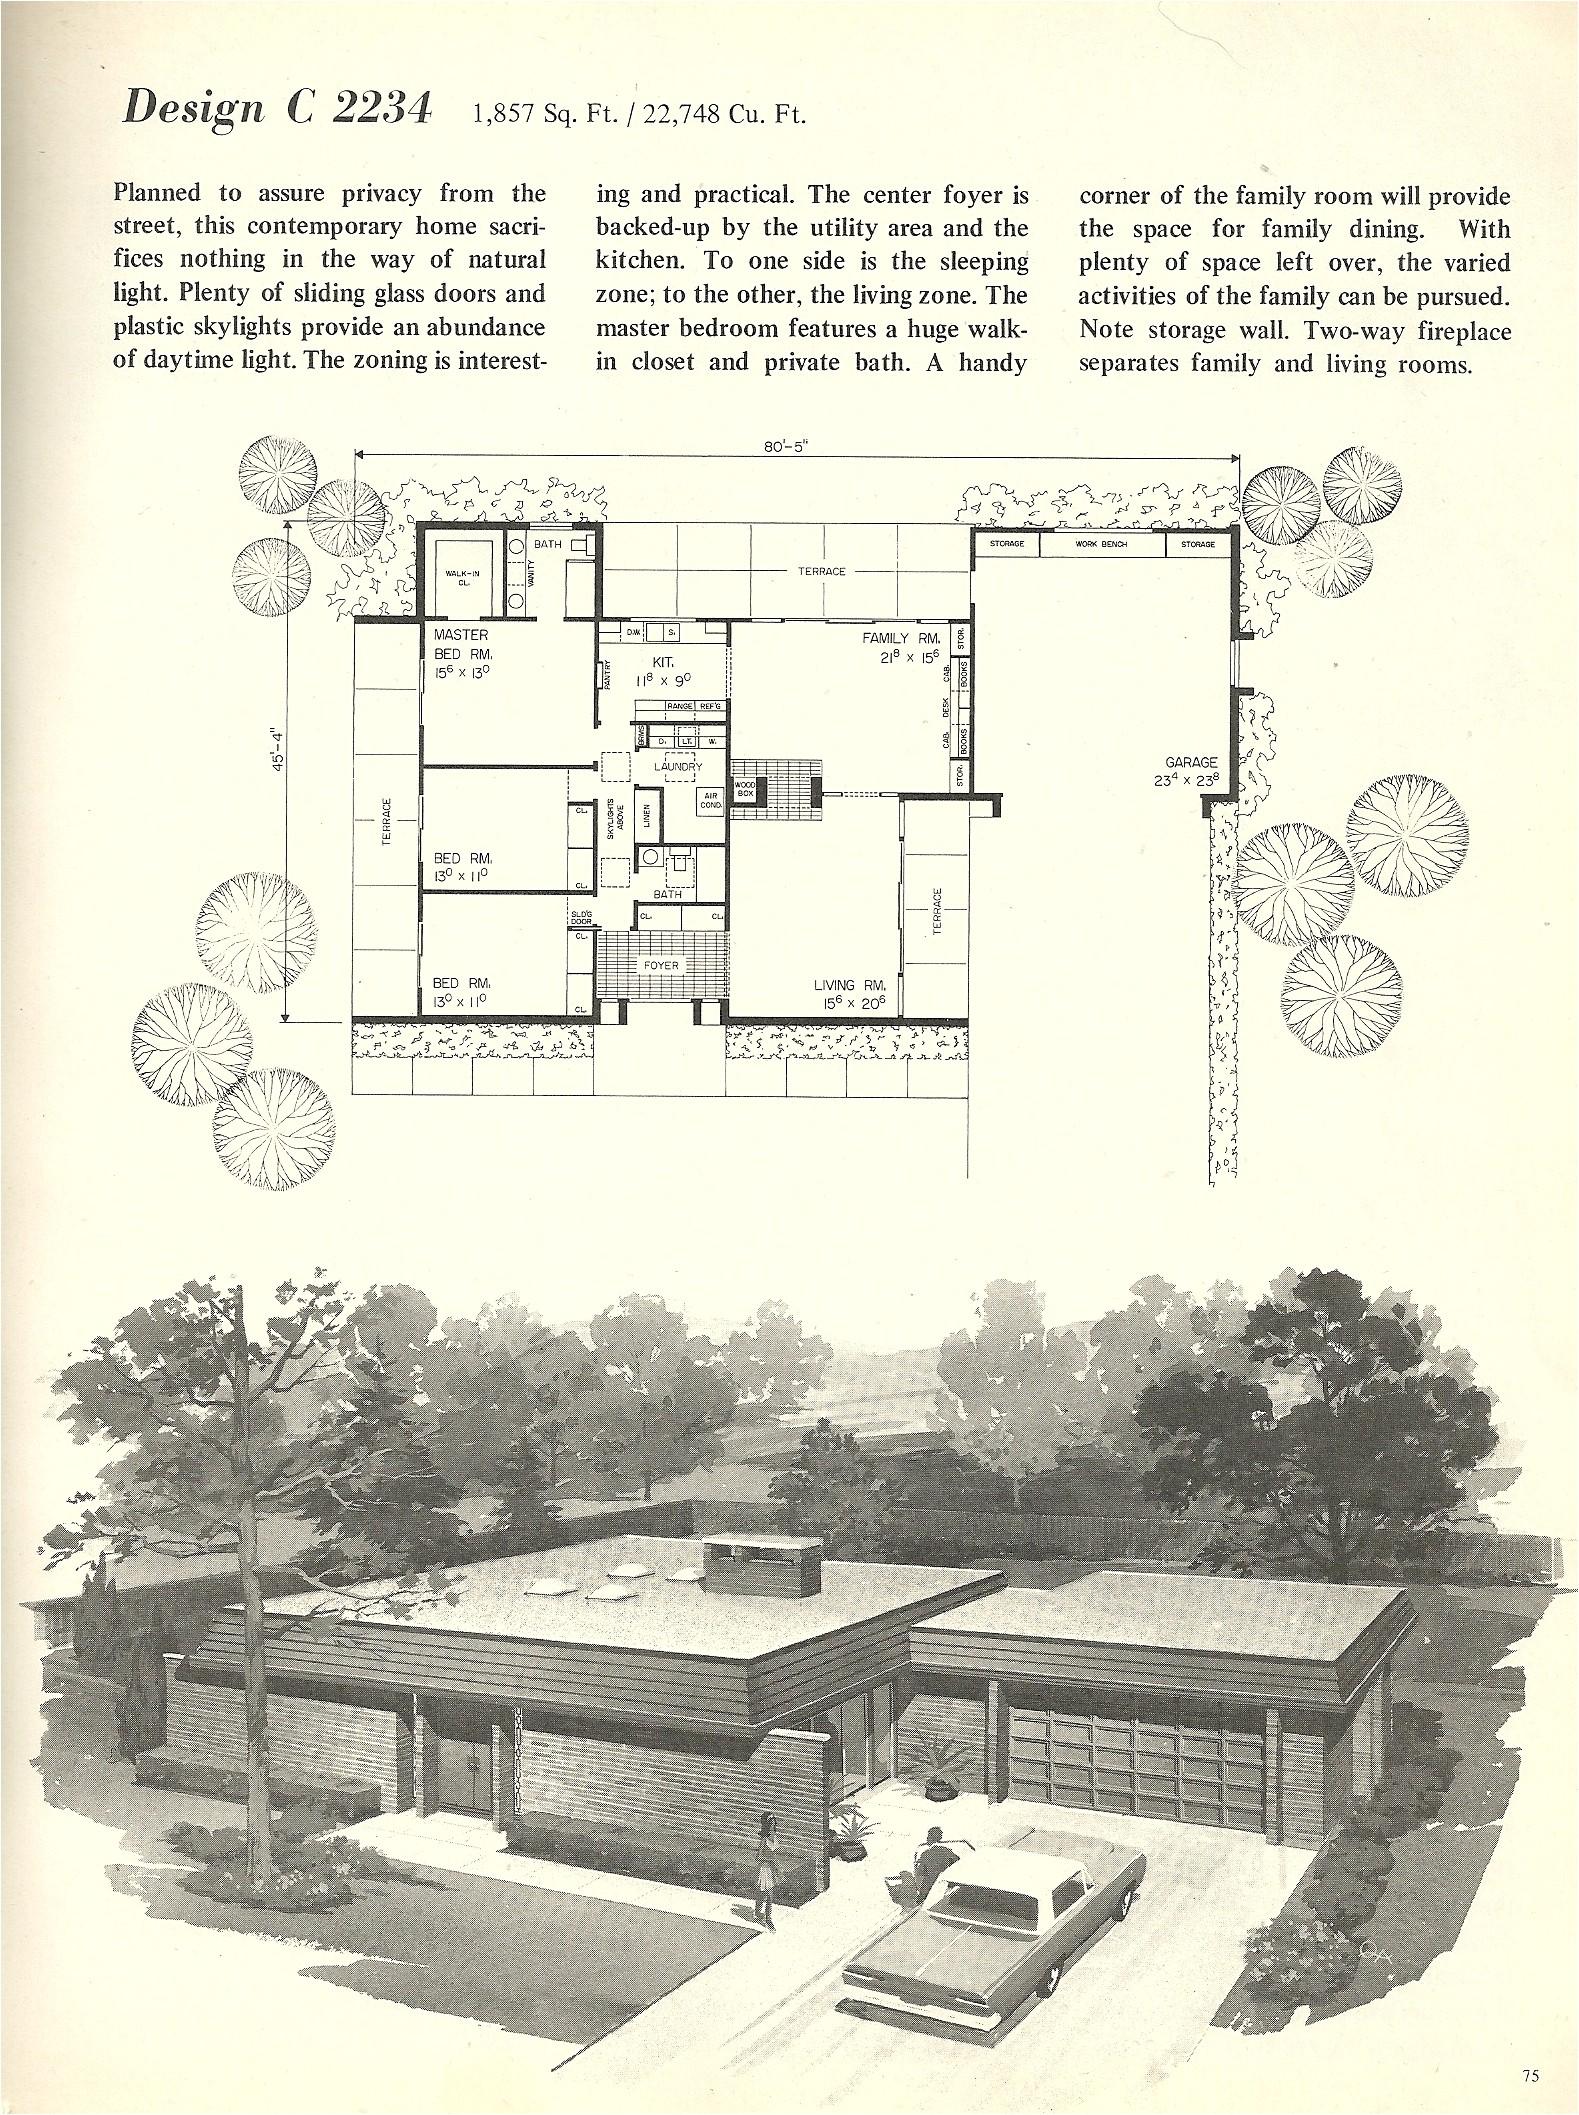 vintage house plans 2234